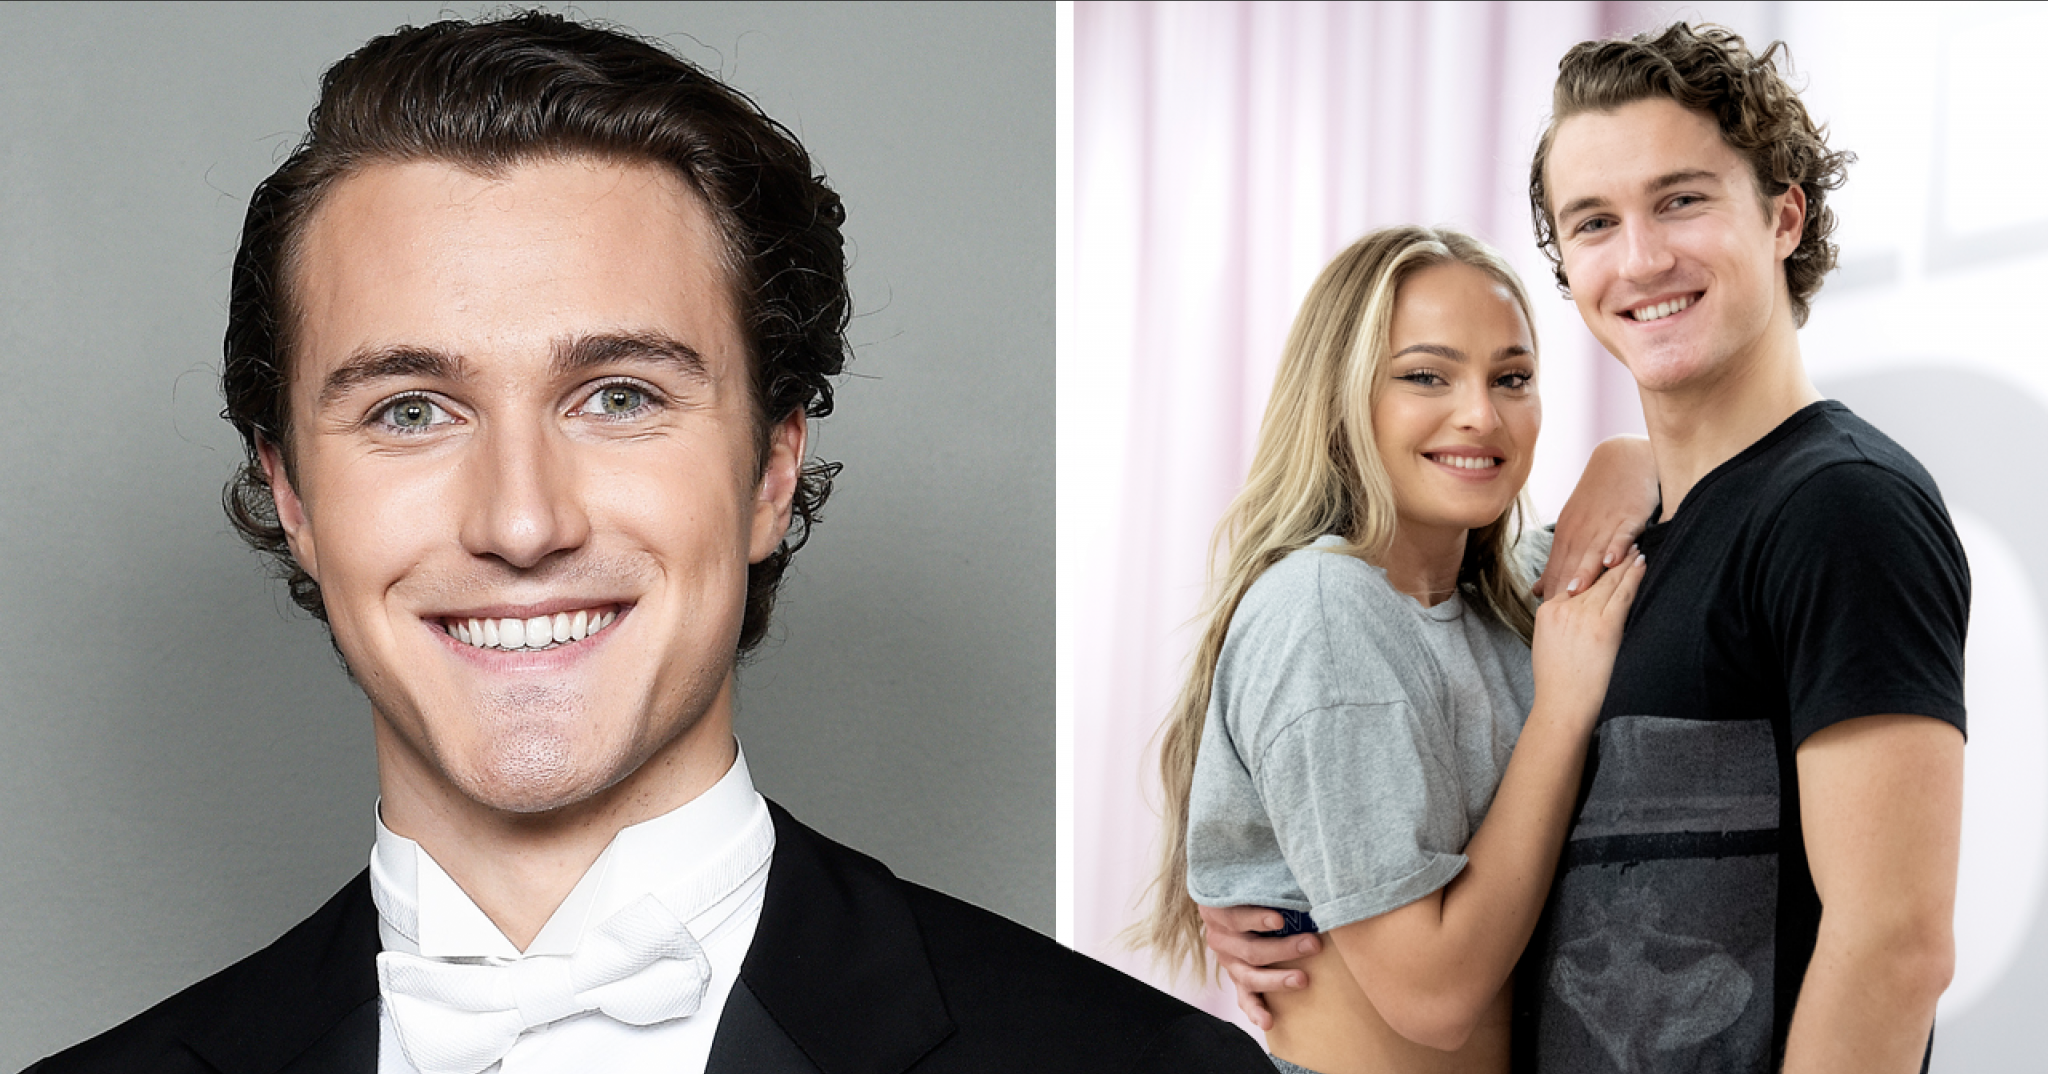 Allt du vill veta om dansaren Hugo Gustafsson i Let's dance